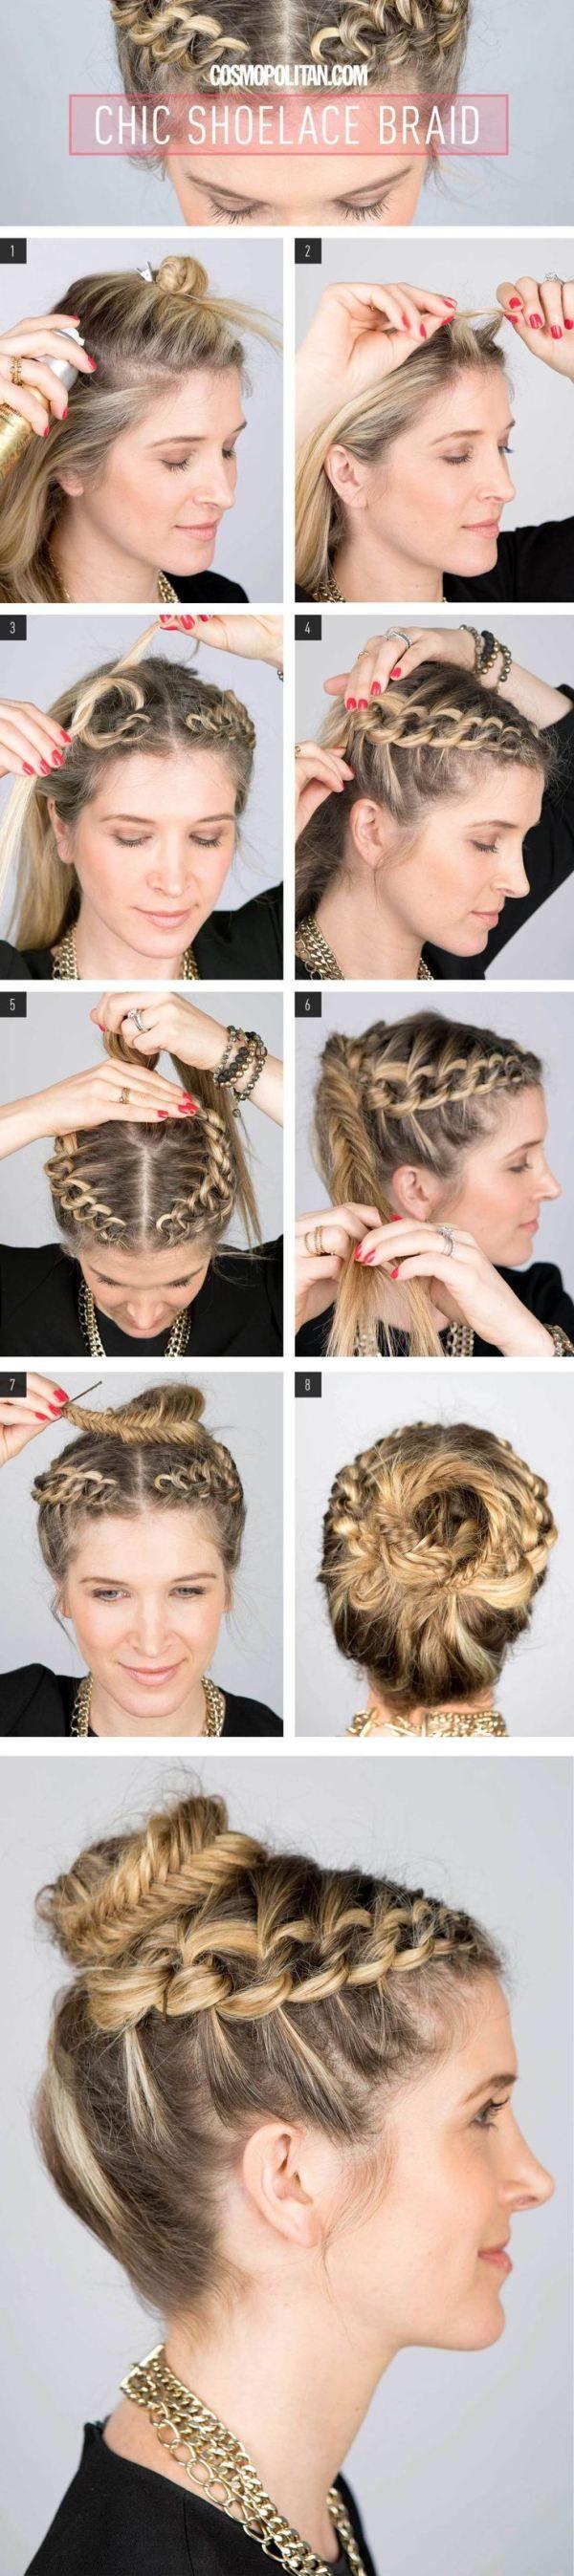 Chic shoelace braid dreadsbraids pinterest shoelace braid